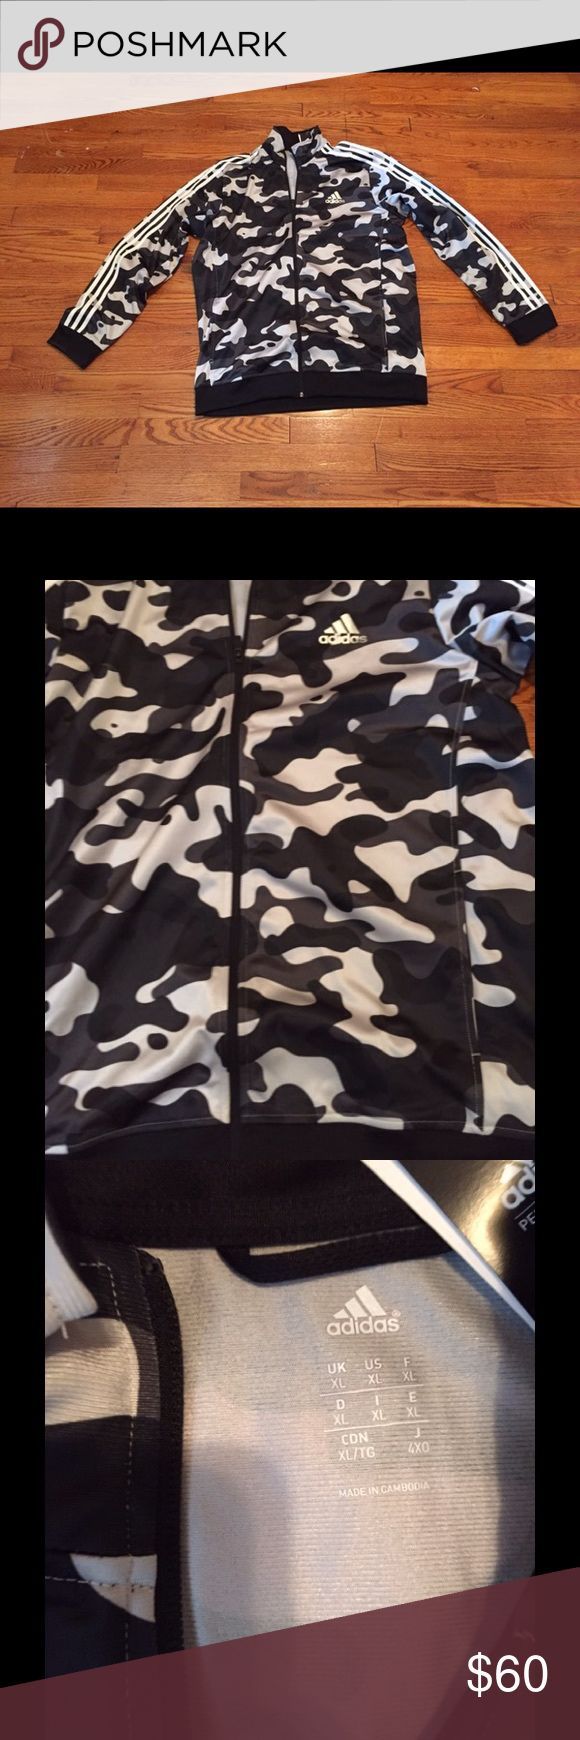 New Adidas Camouflage Zip Up Jacket. New Adidas Camouflage Zip Up Jacket. Size. M Adidas Jackets & Coats Lightweight & Shirt Jackets